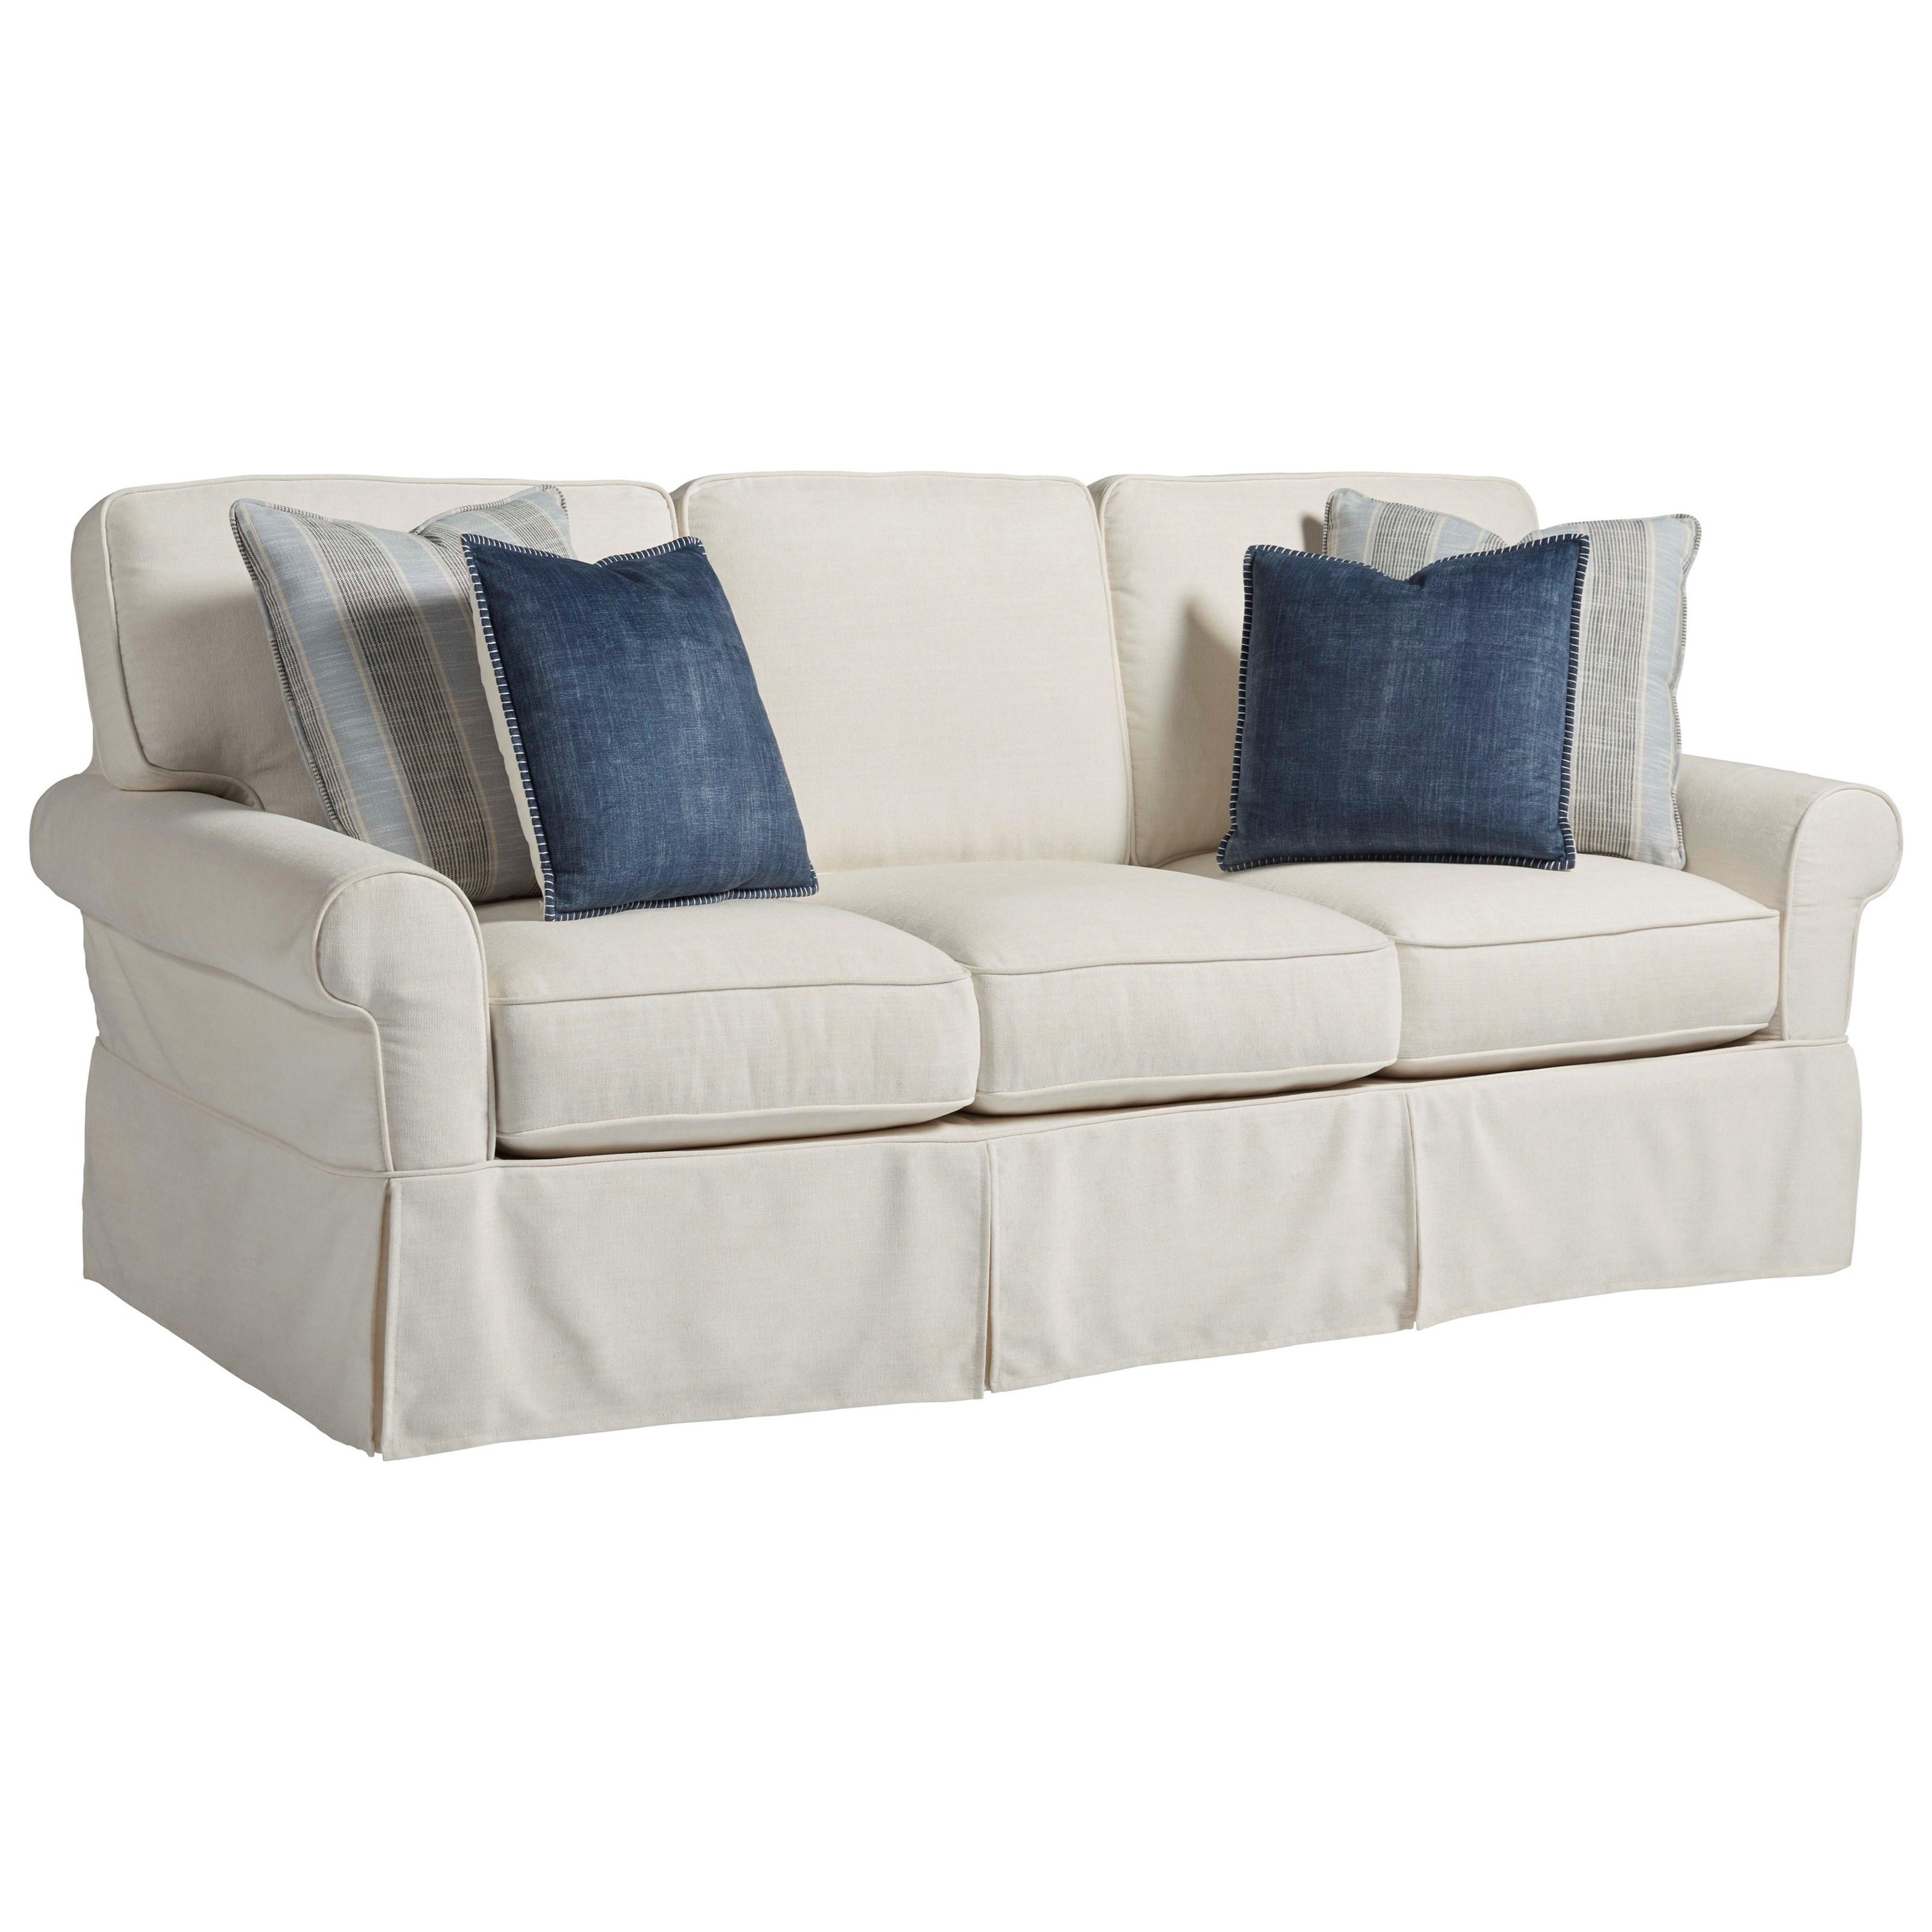 Coastal Living Home - Escape Ventura Sofa by Universal at Baer's Furniture